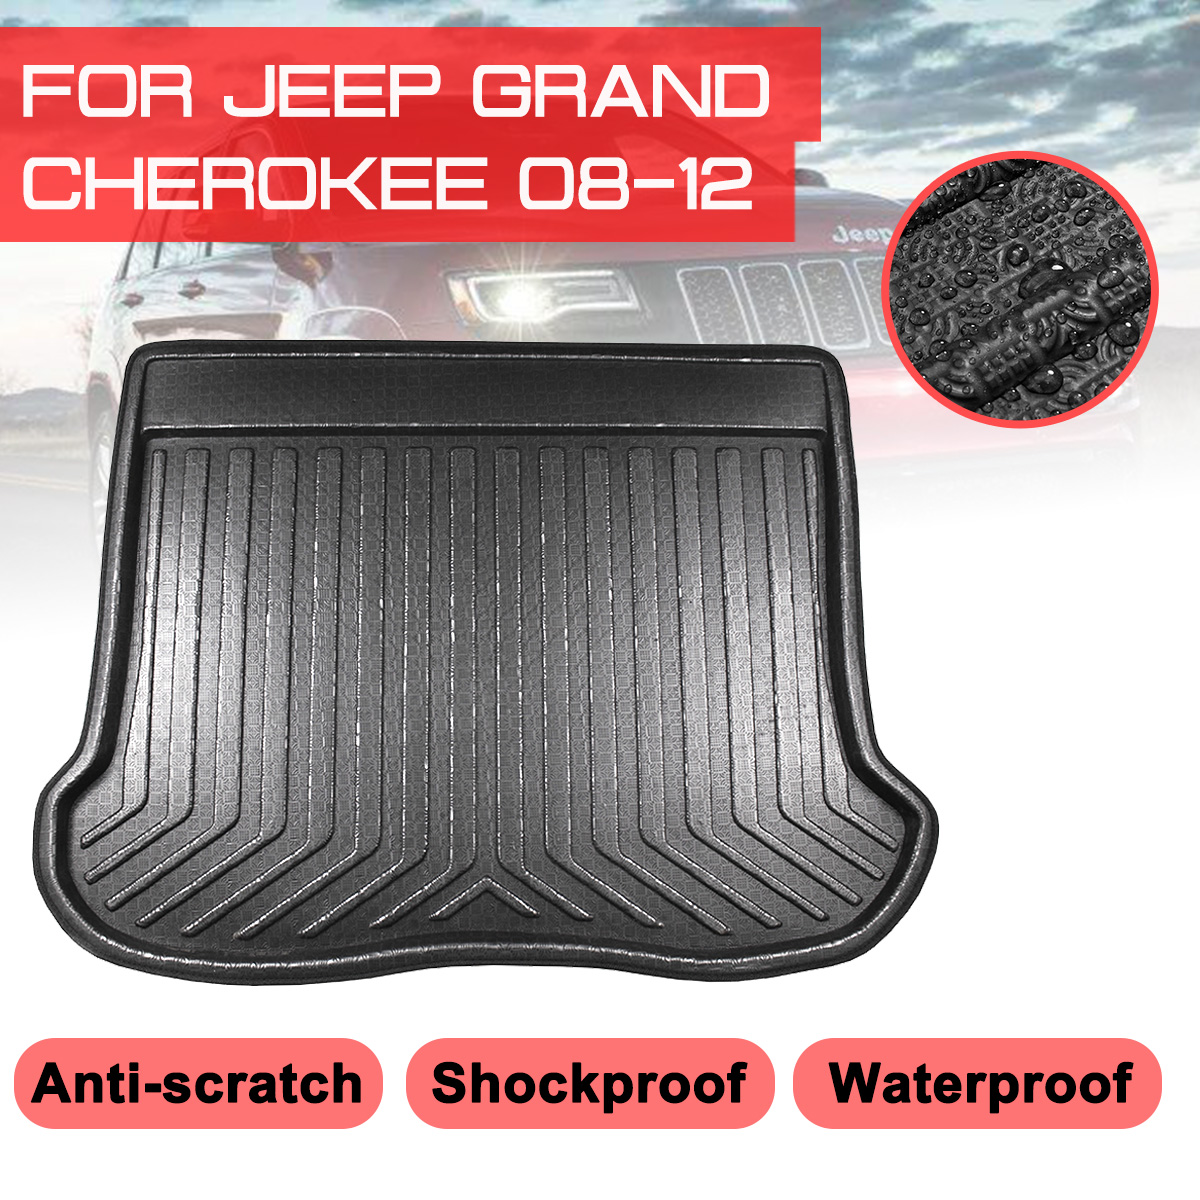 Car Rear Trunk Boot Mat For Jeep Grand Cherokee 2008 2009 2010-2012 Waterproof Floor Mats Carpet Anti Mud Tray Cargo Liner